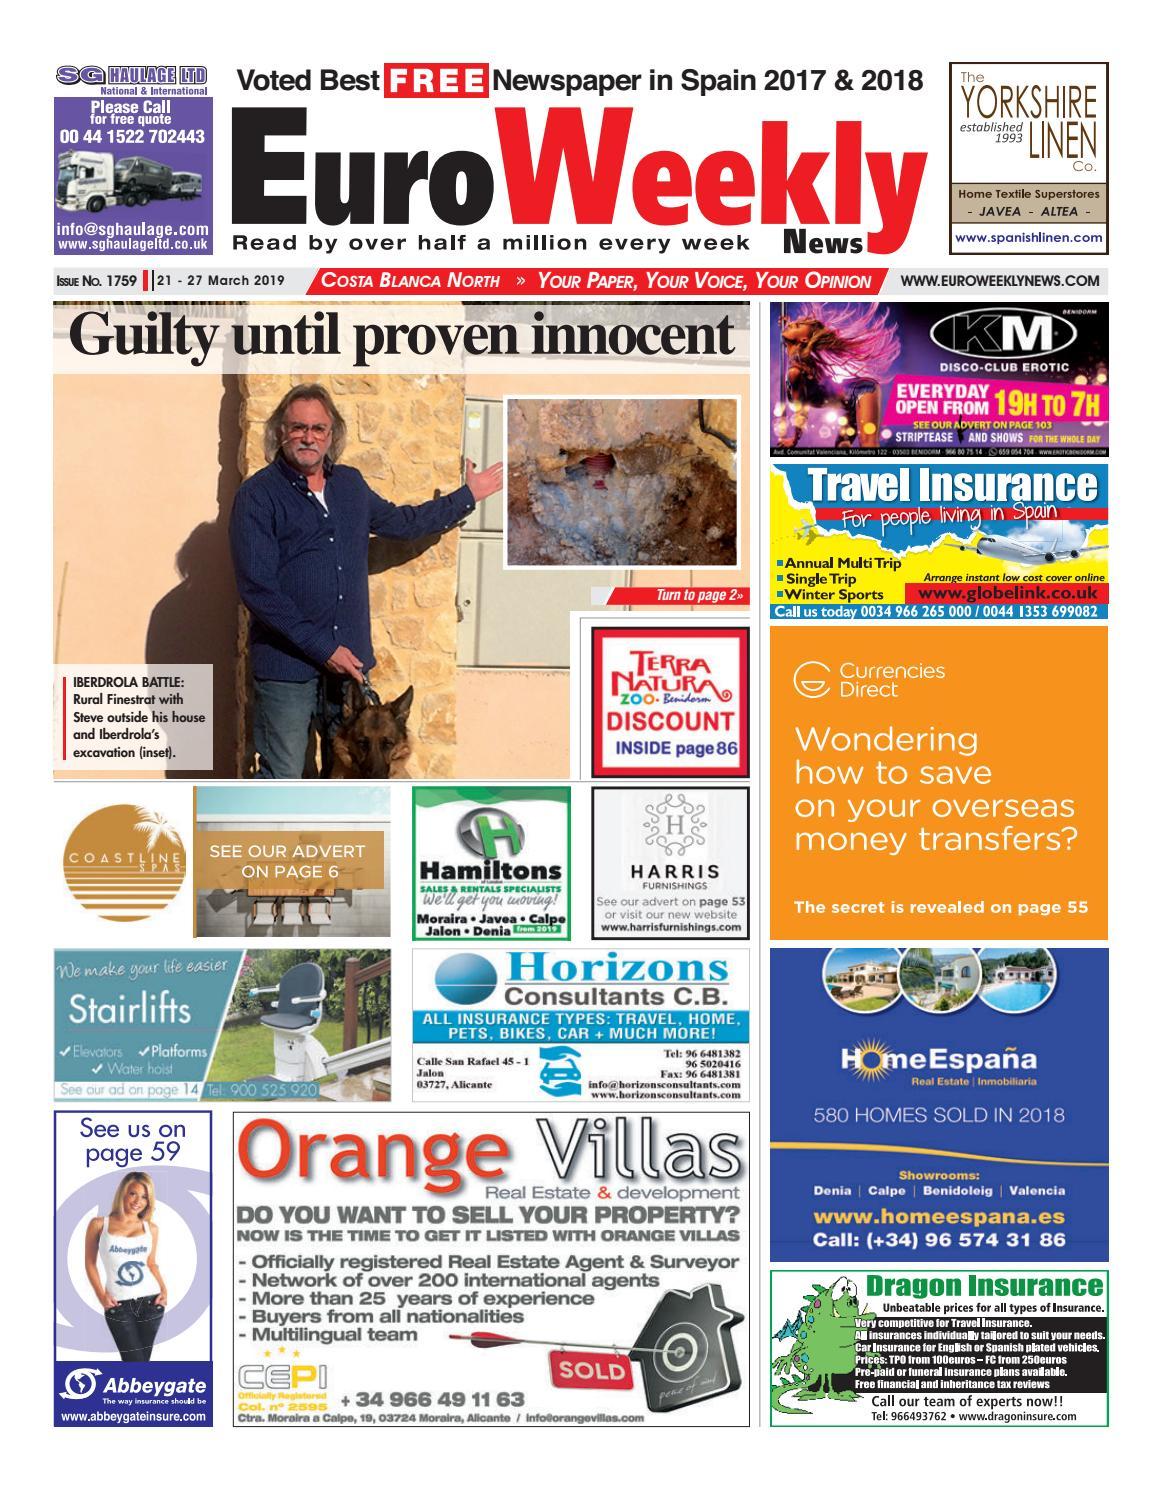 Animal Crossing Drawing Blanca Face Porn euro weekly news - costa blanca north 21 - 27 march 2019